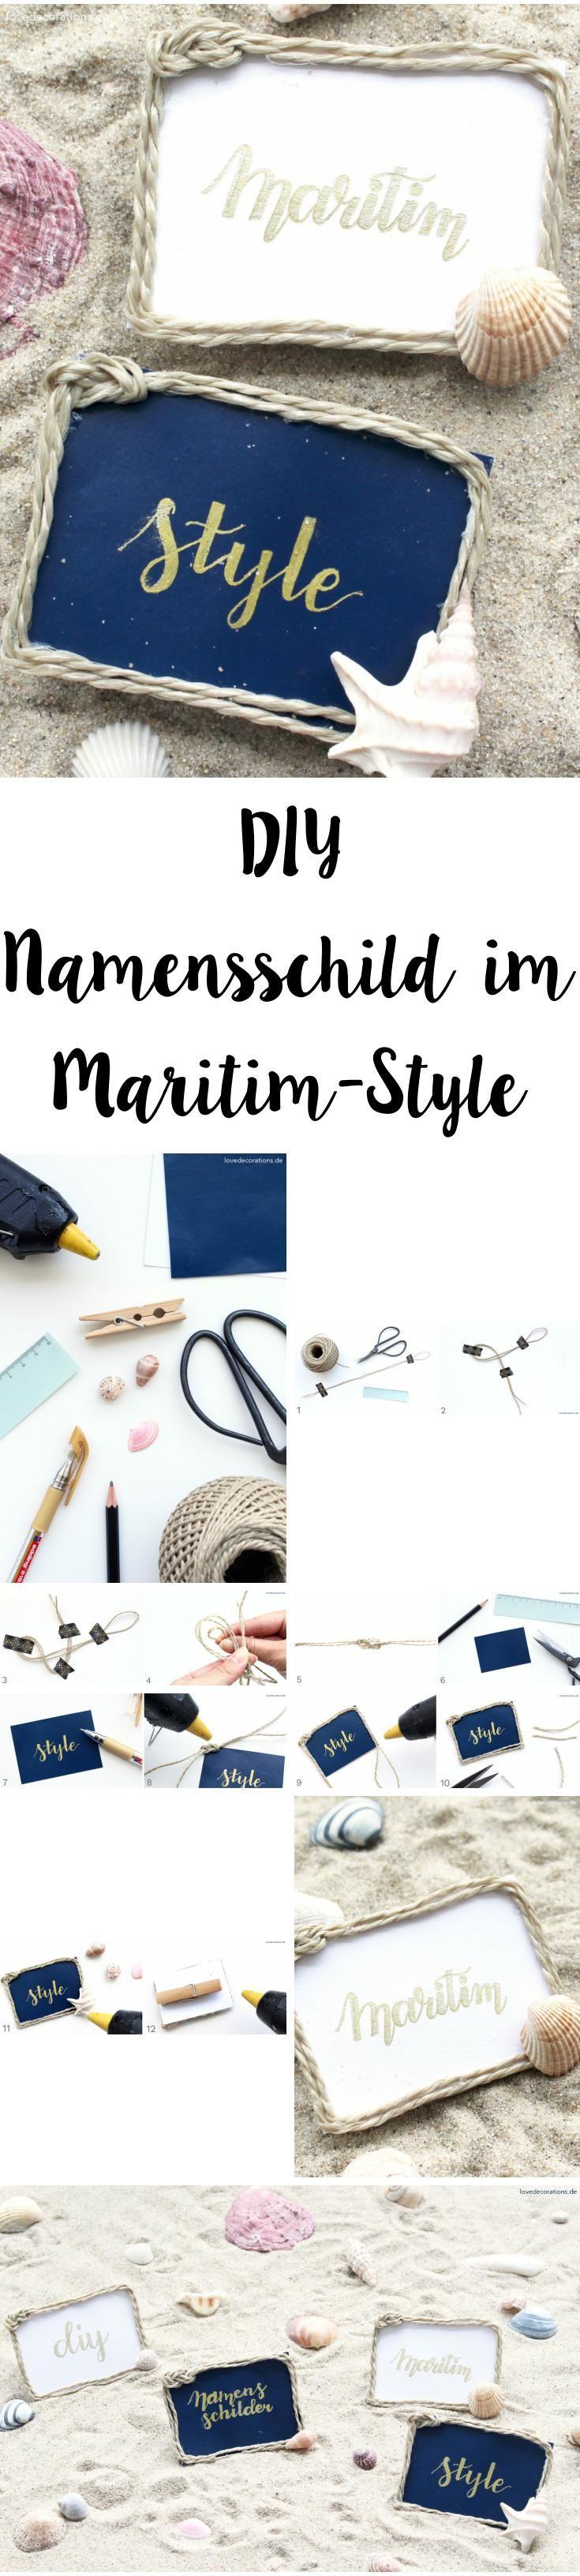 DIY Namensschilder im Maritim-Style | DIY Name Tags in Maritime Style